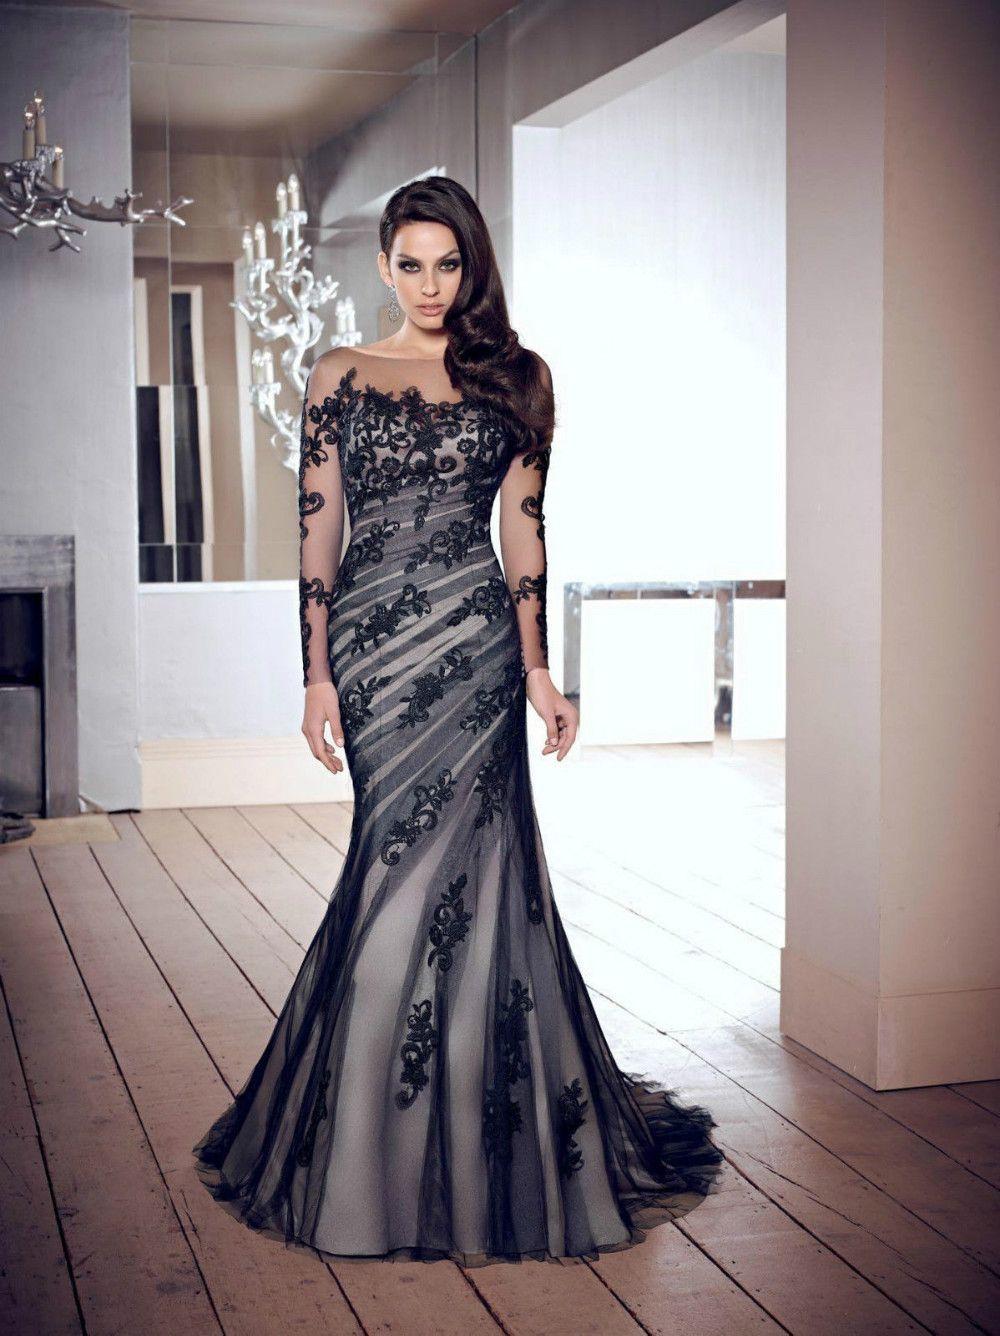 wedding dresses black black lace wedding dress buy sexy black lace custom jewel wedding gown long sleeve mermaid prom